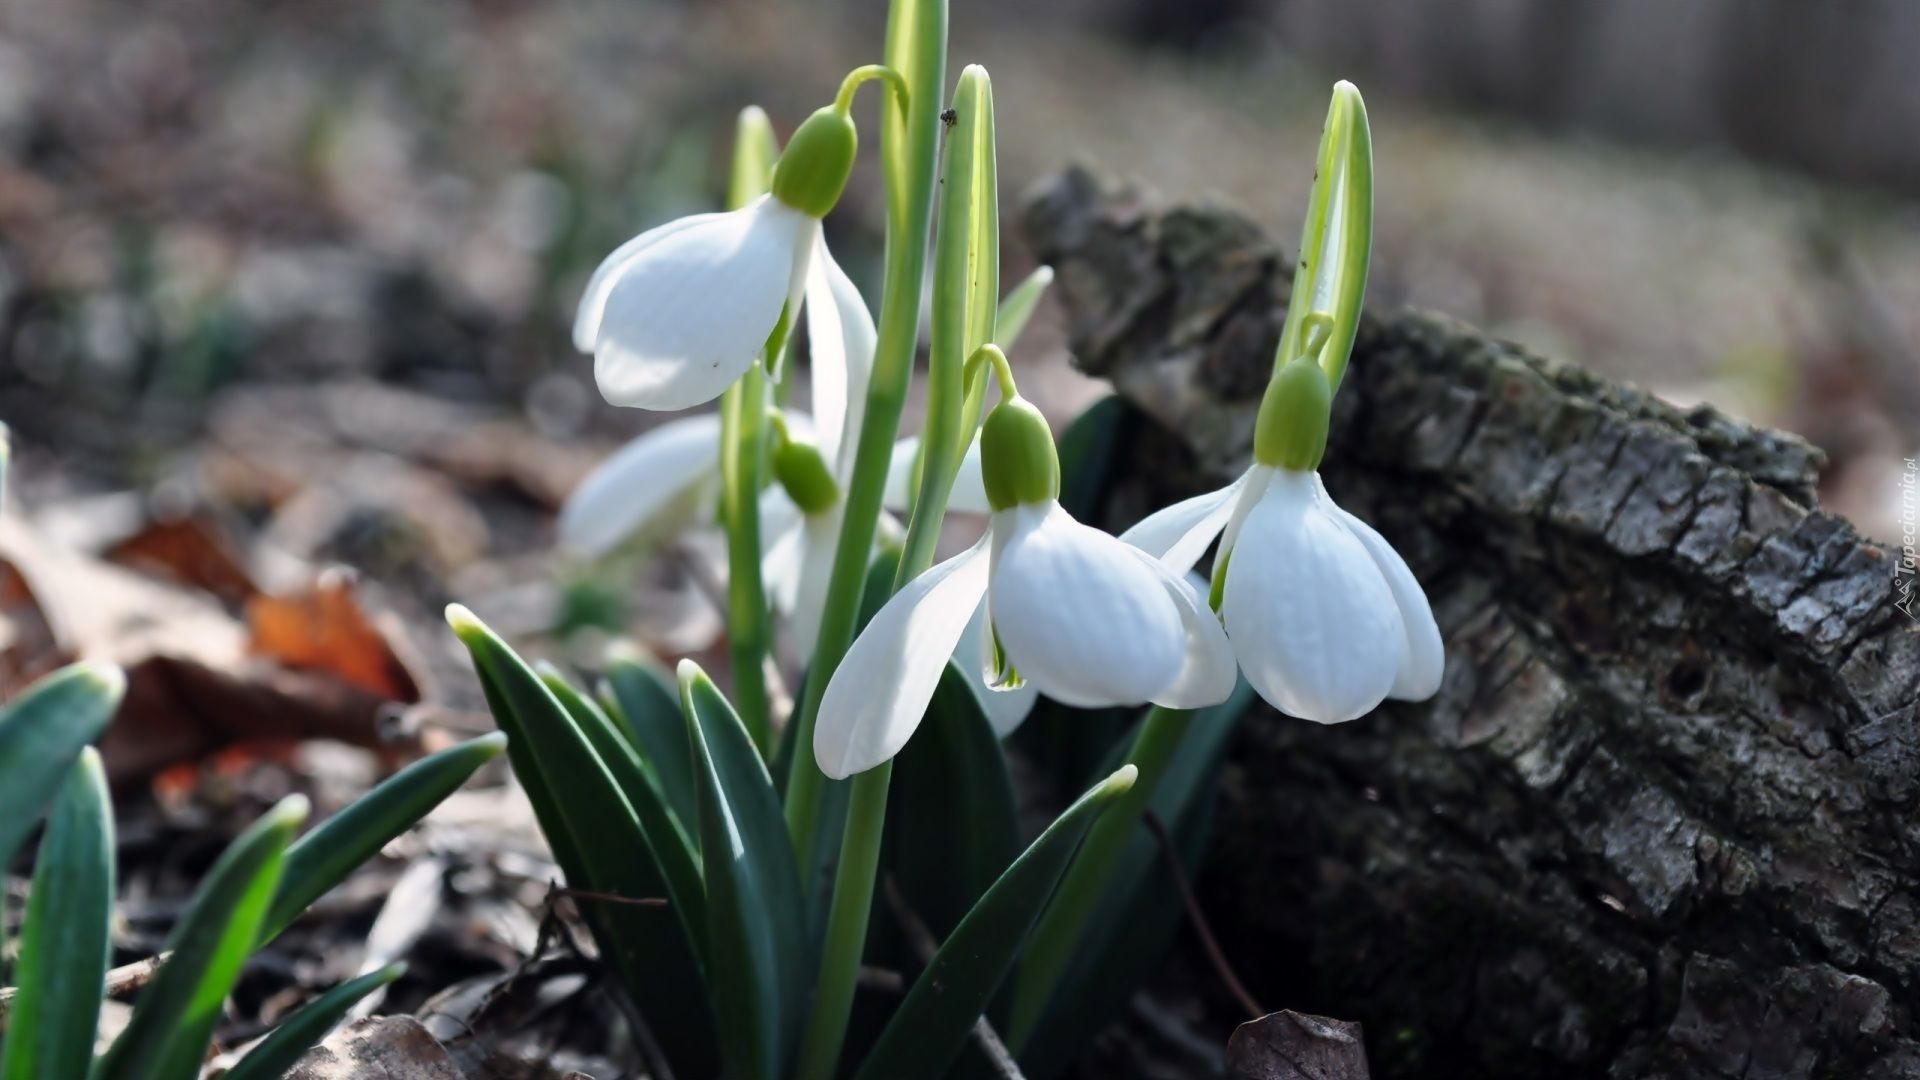 Kwiaty Przebisniegi Spring Wallpaper Succulents Garden Nature Inspiration